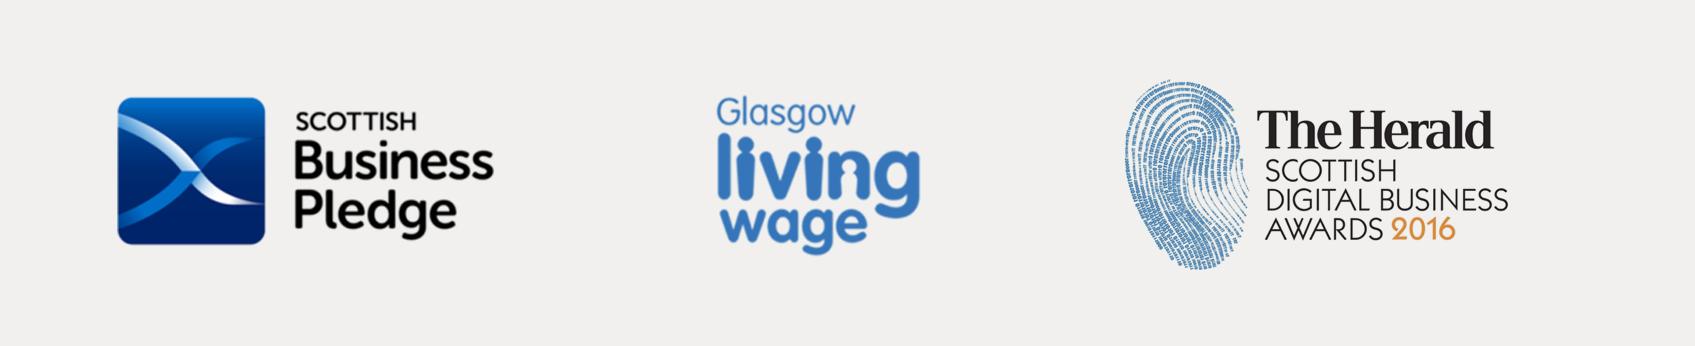 Scottish Pledge, Glasgow living wage, the herald scottish digital awards